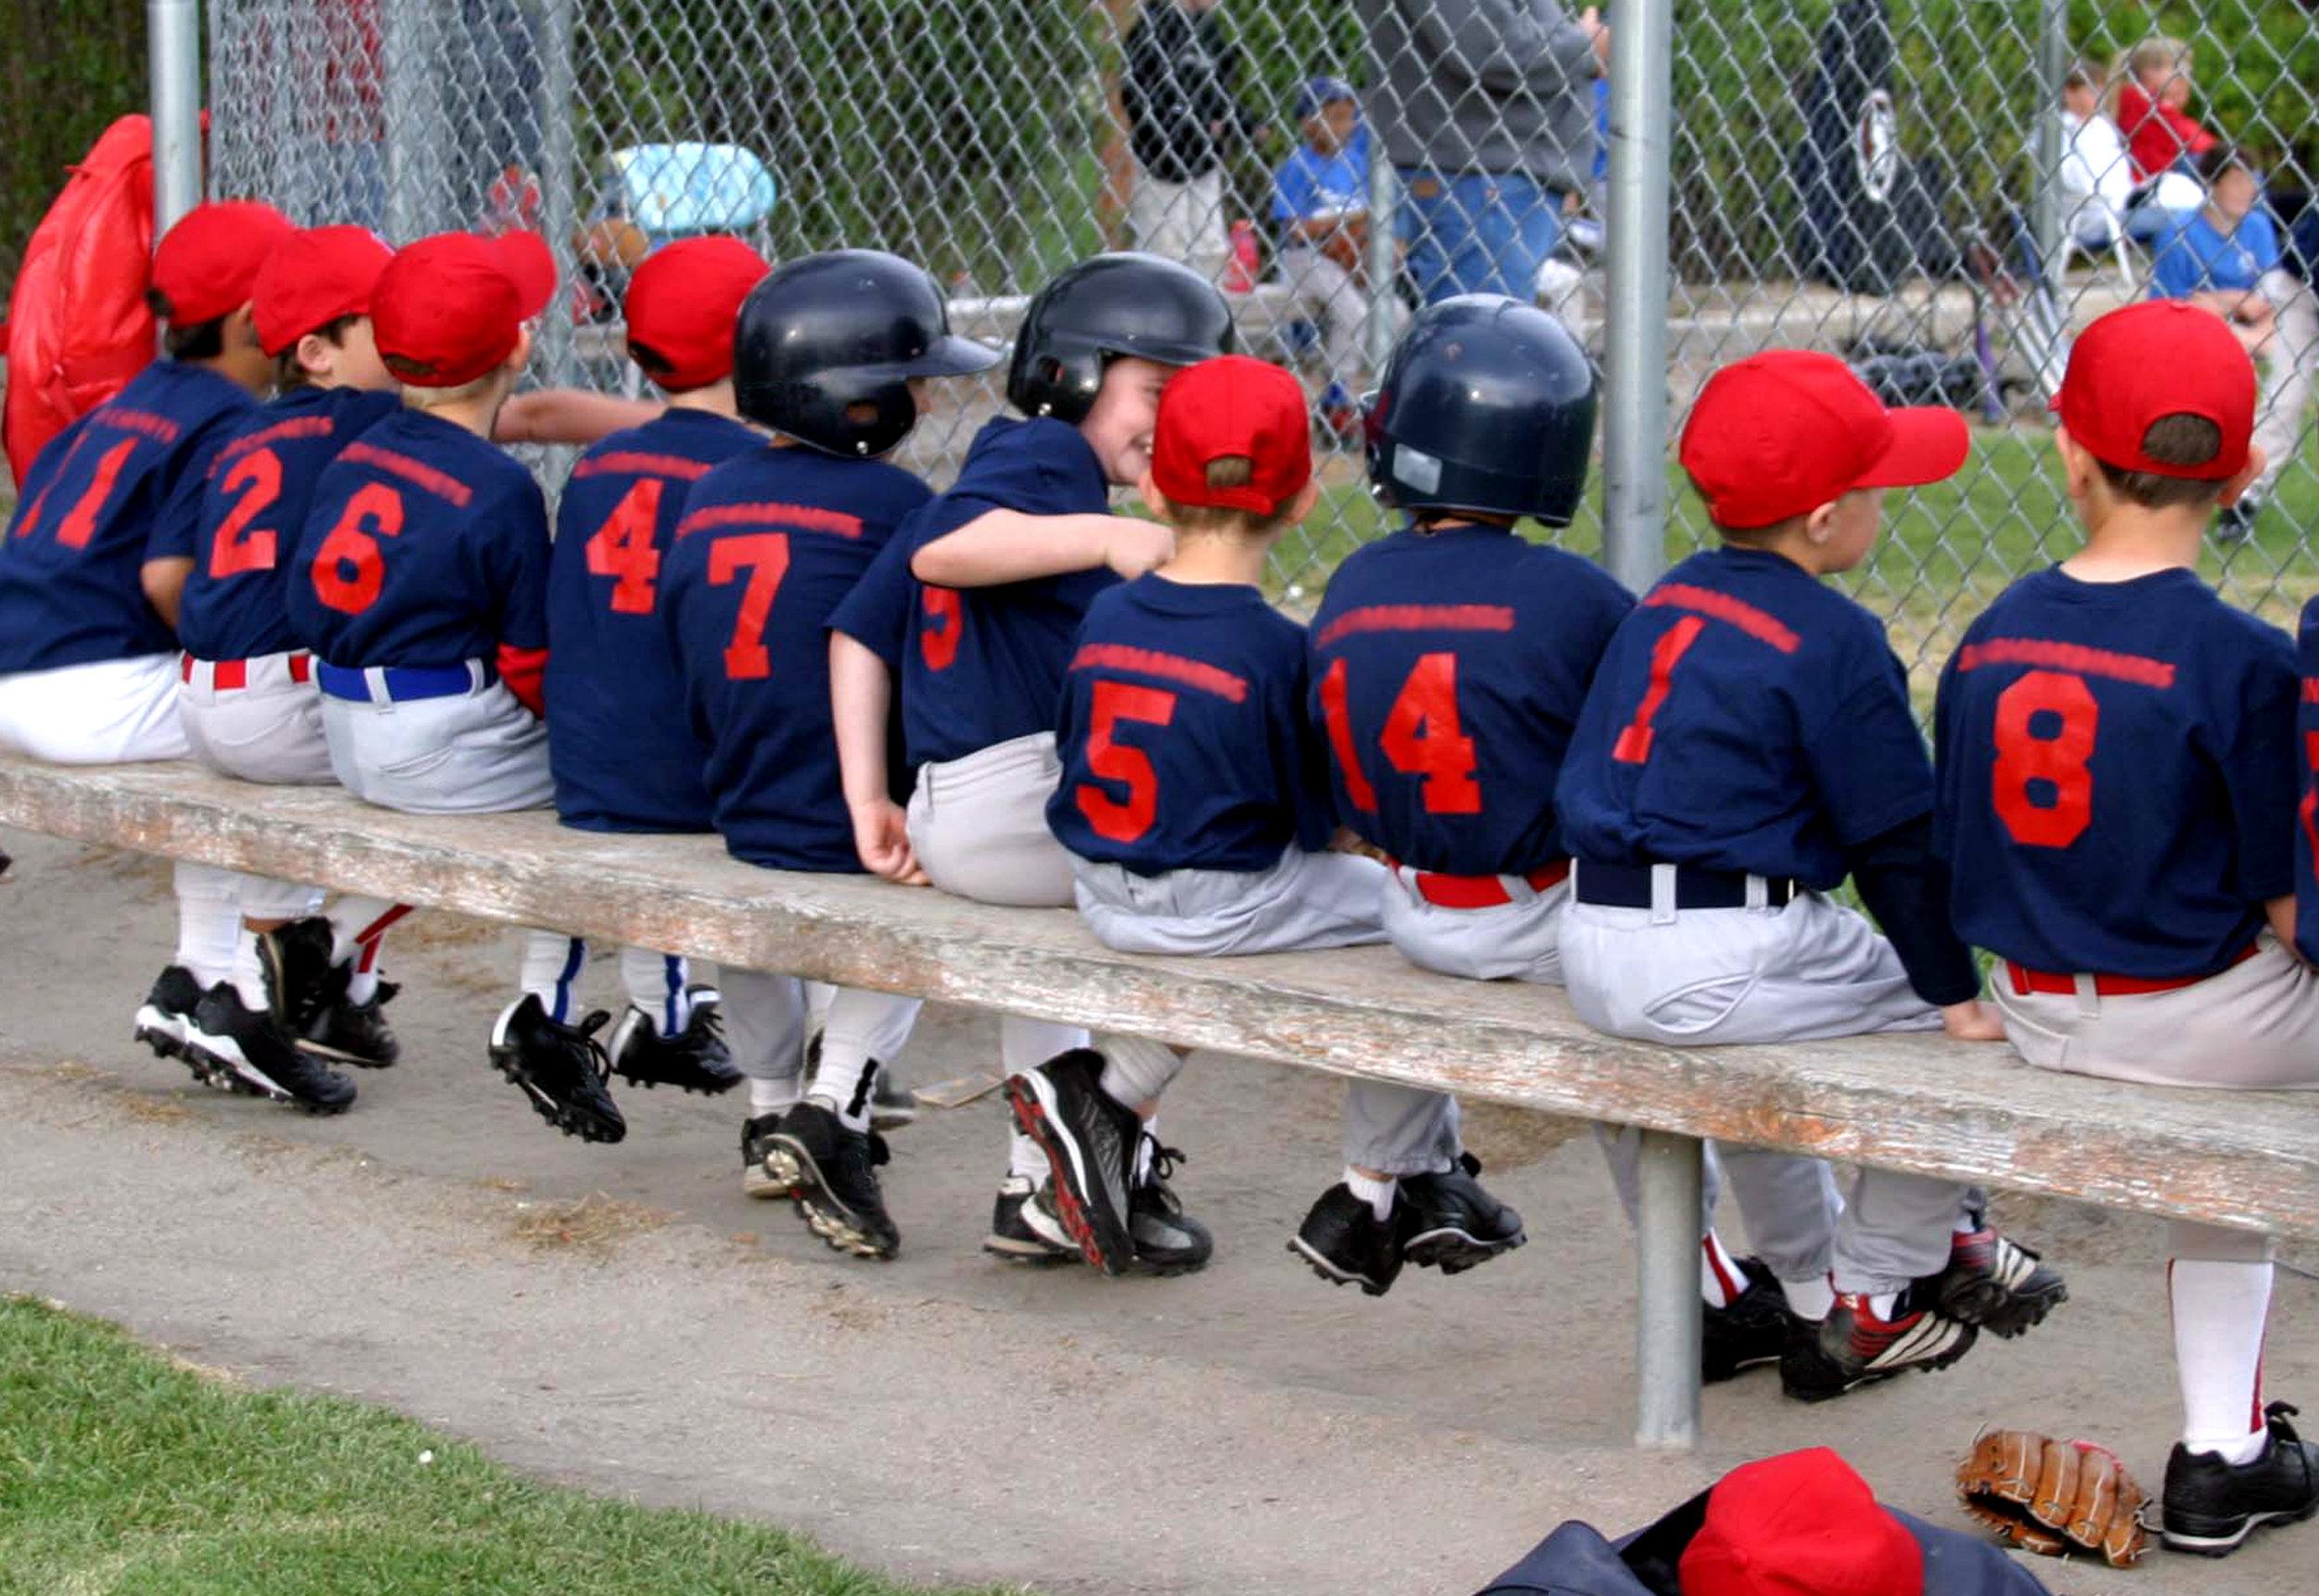 Sports Leagues & School Spirit